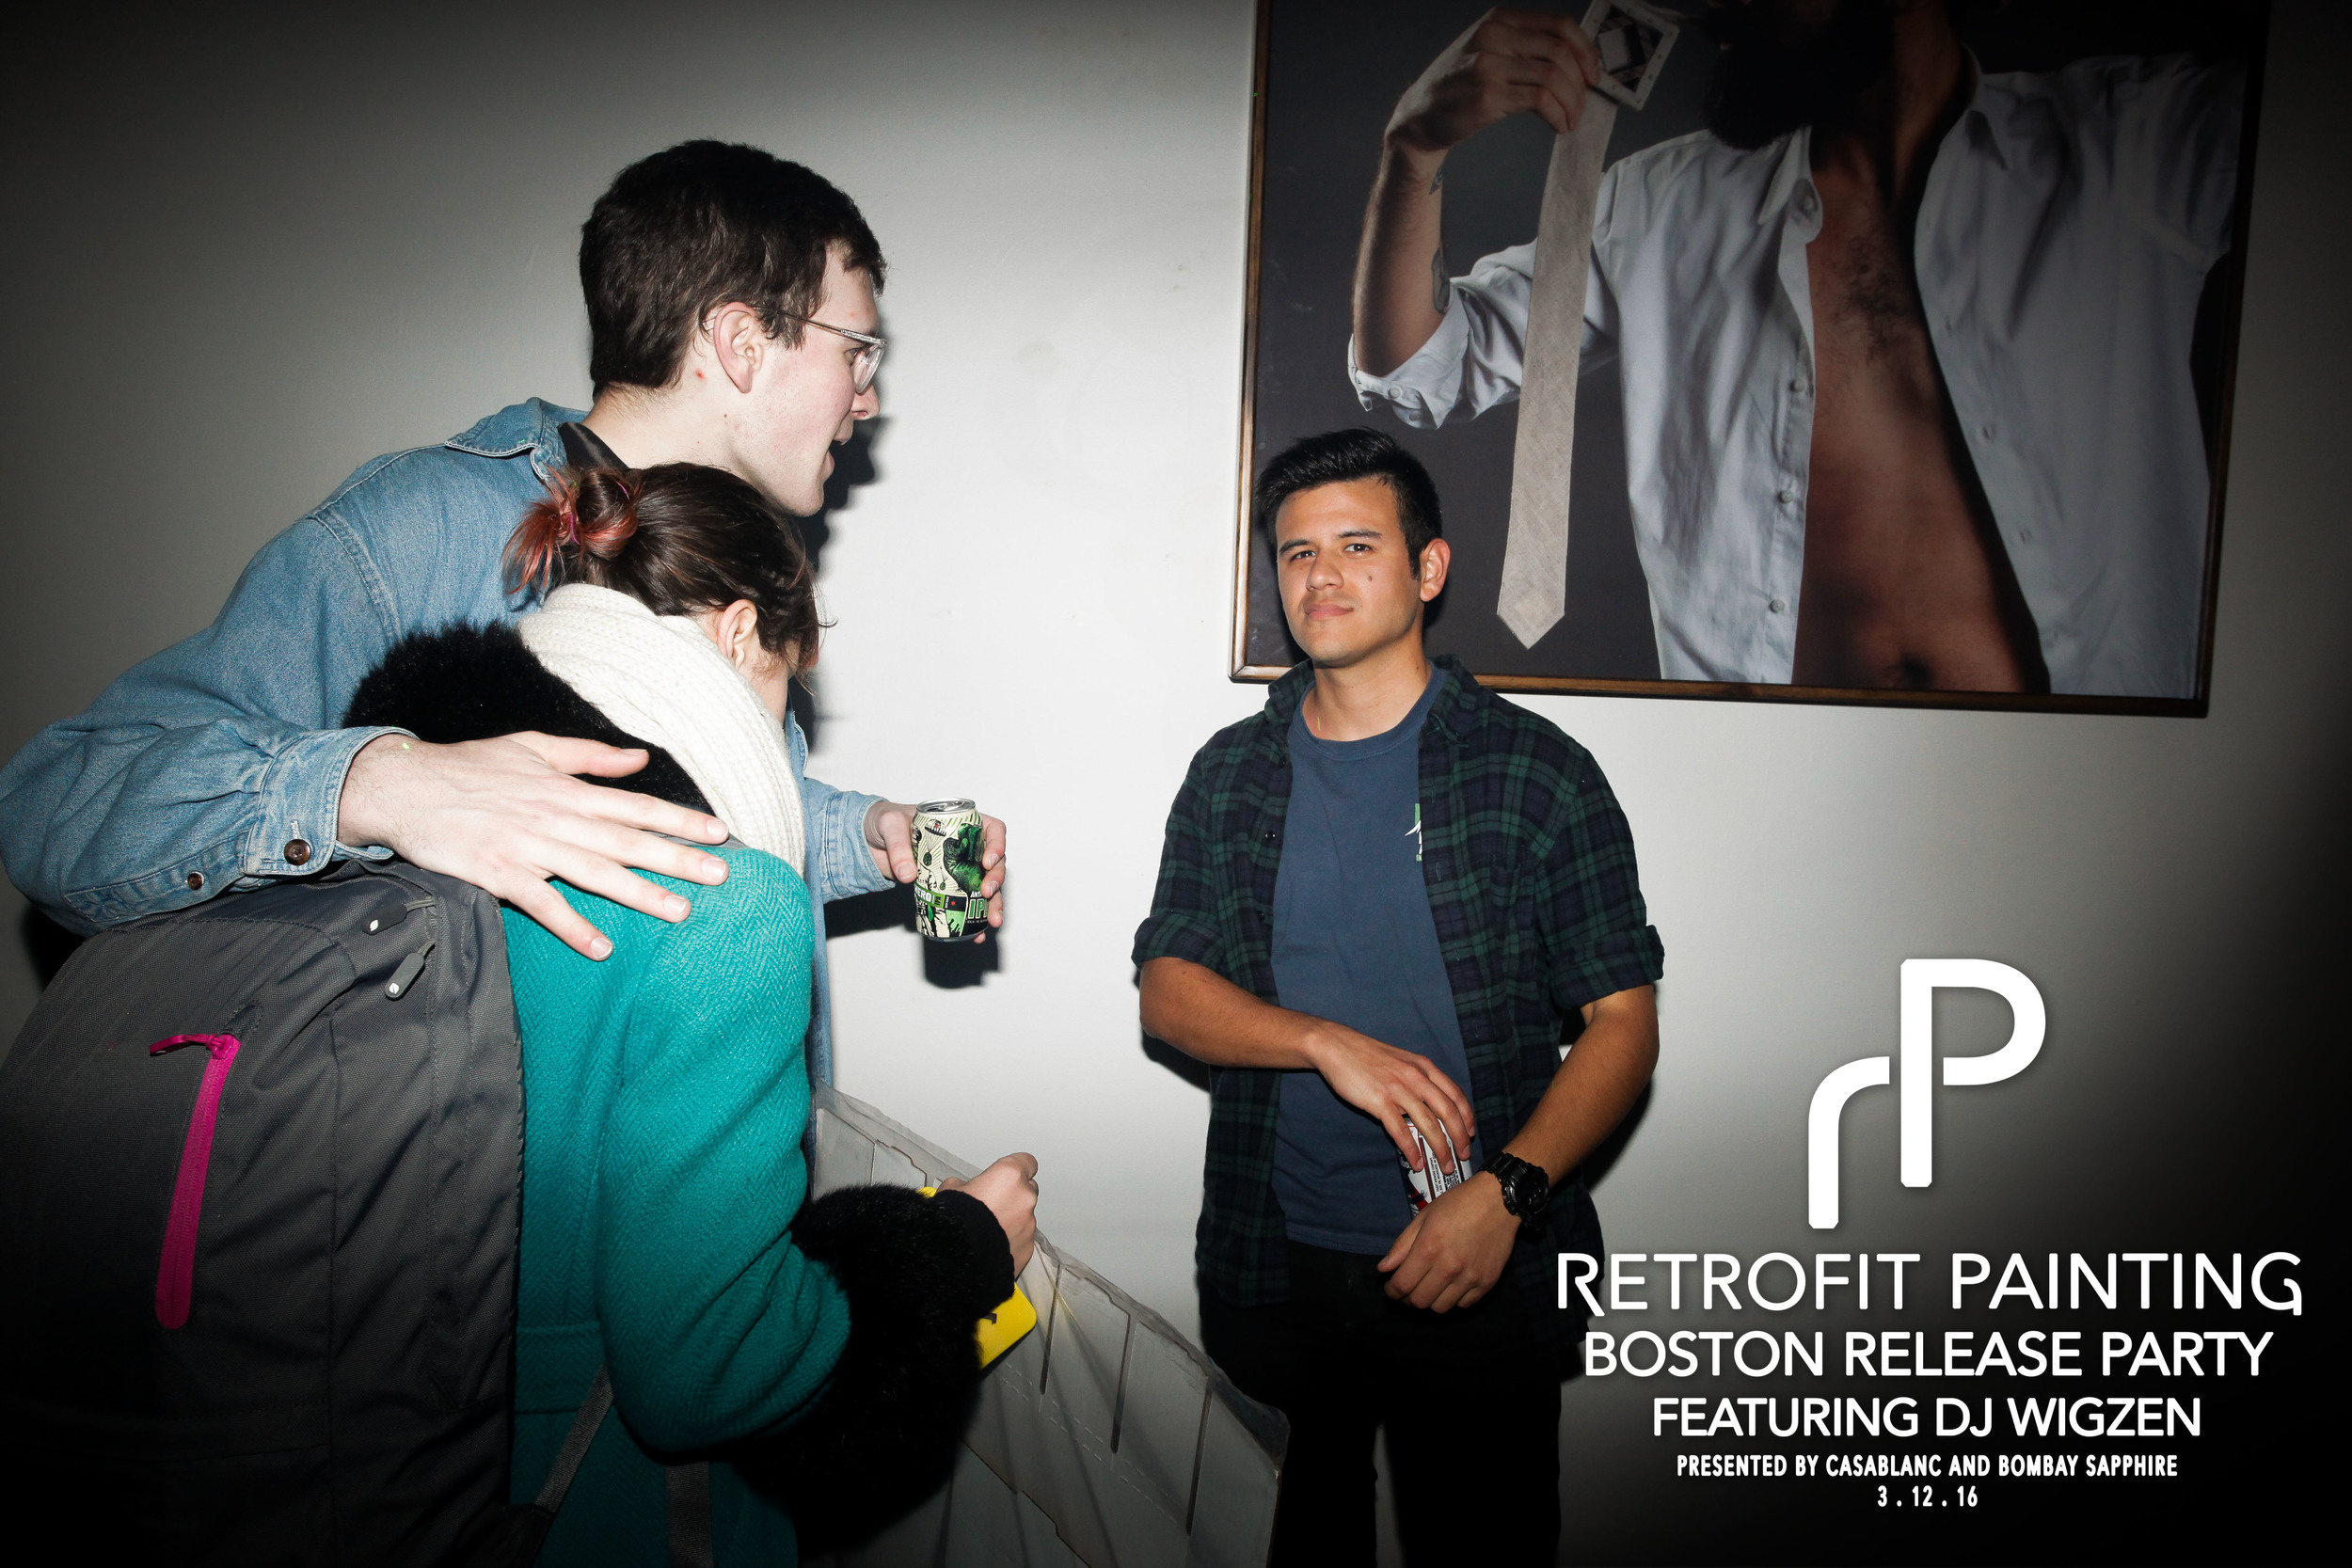 Retrofit Painting Boston Release Party 0140.jpg